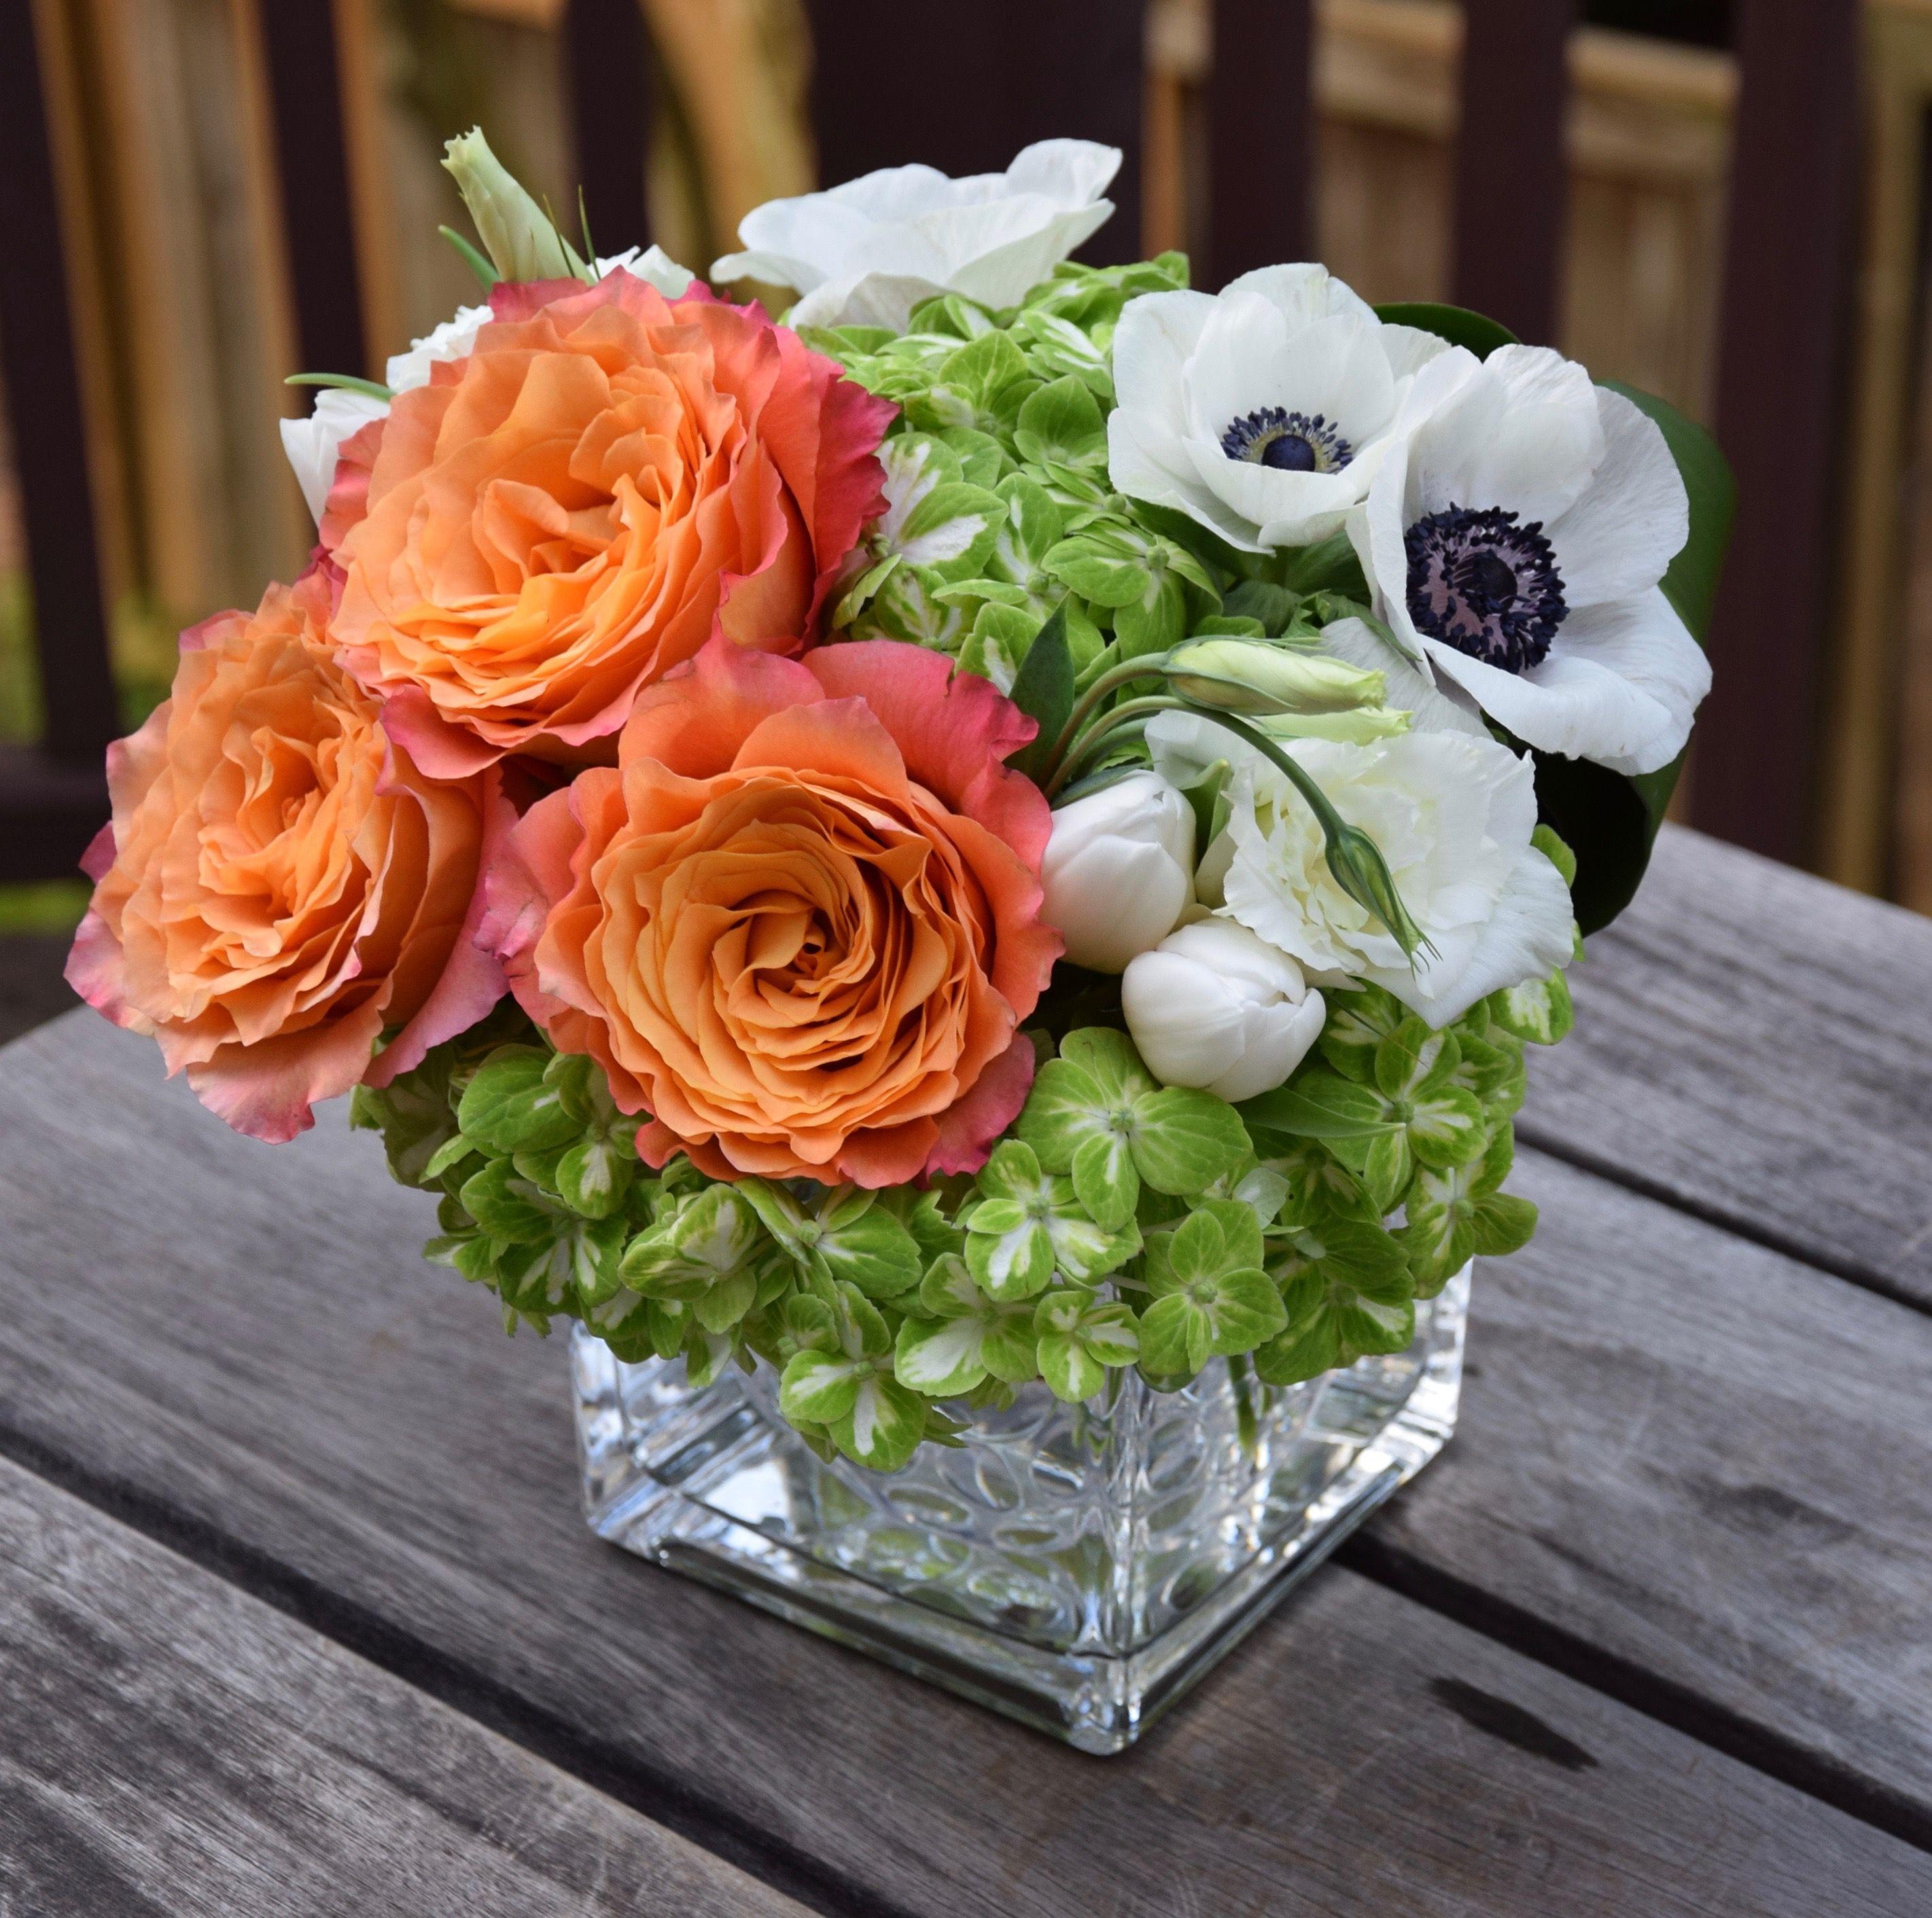 Fresh Flowers In A Vase Anemone Free Spirit Rose Hydrangeas